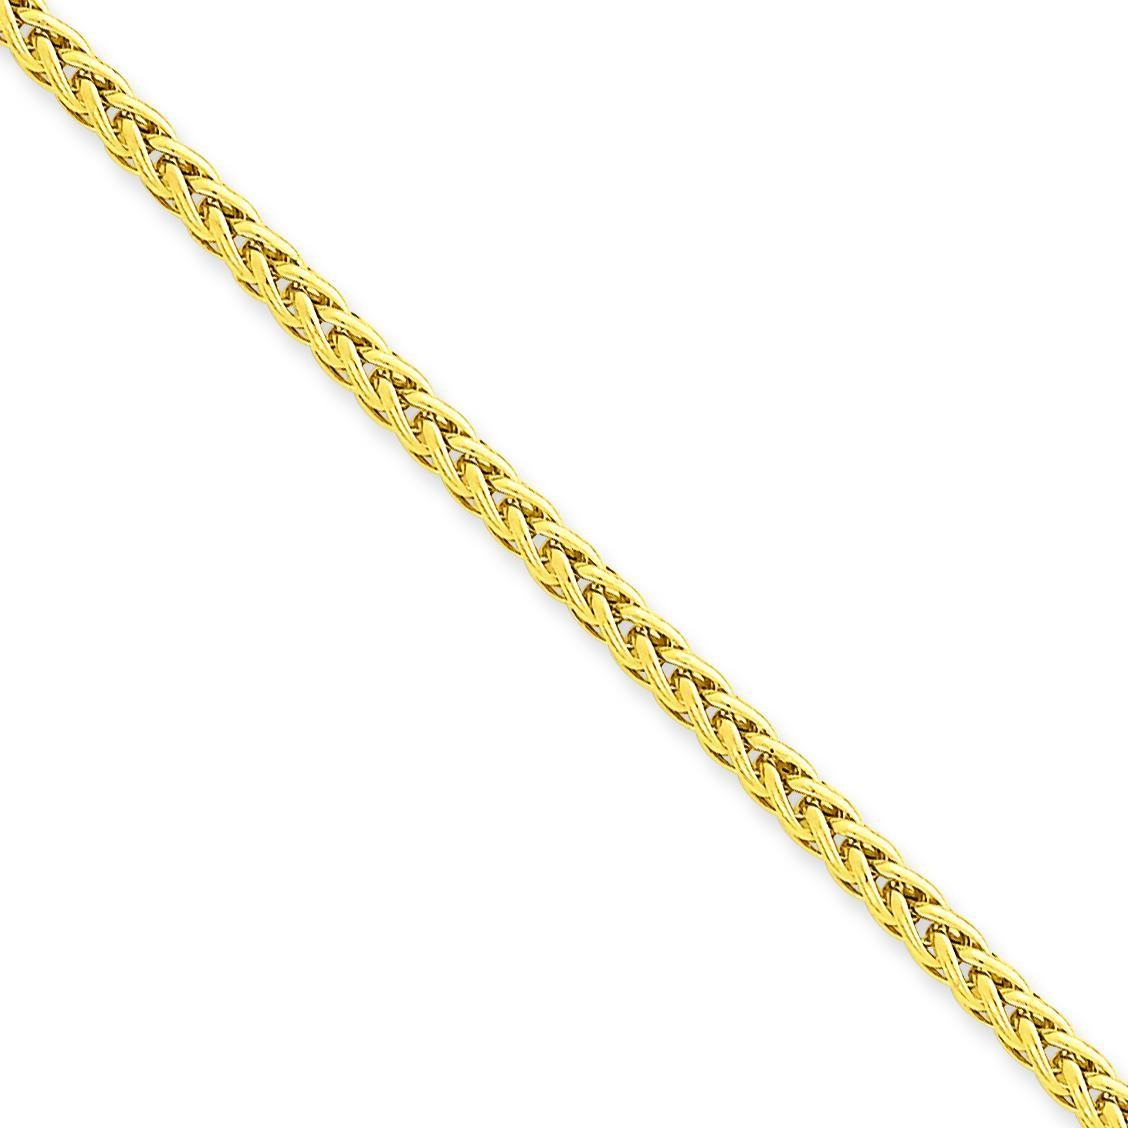 14k Yellow Gold 16 inch 2.60 mm Light Wheat Choker Necklace